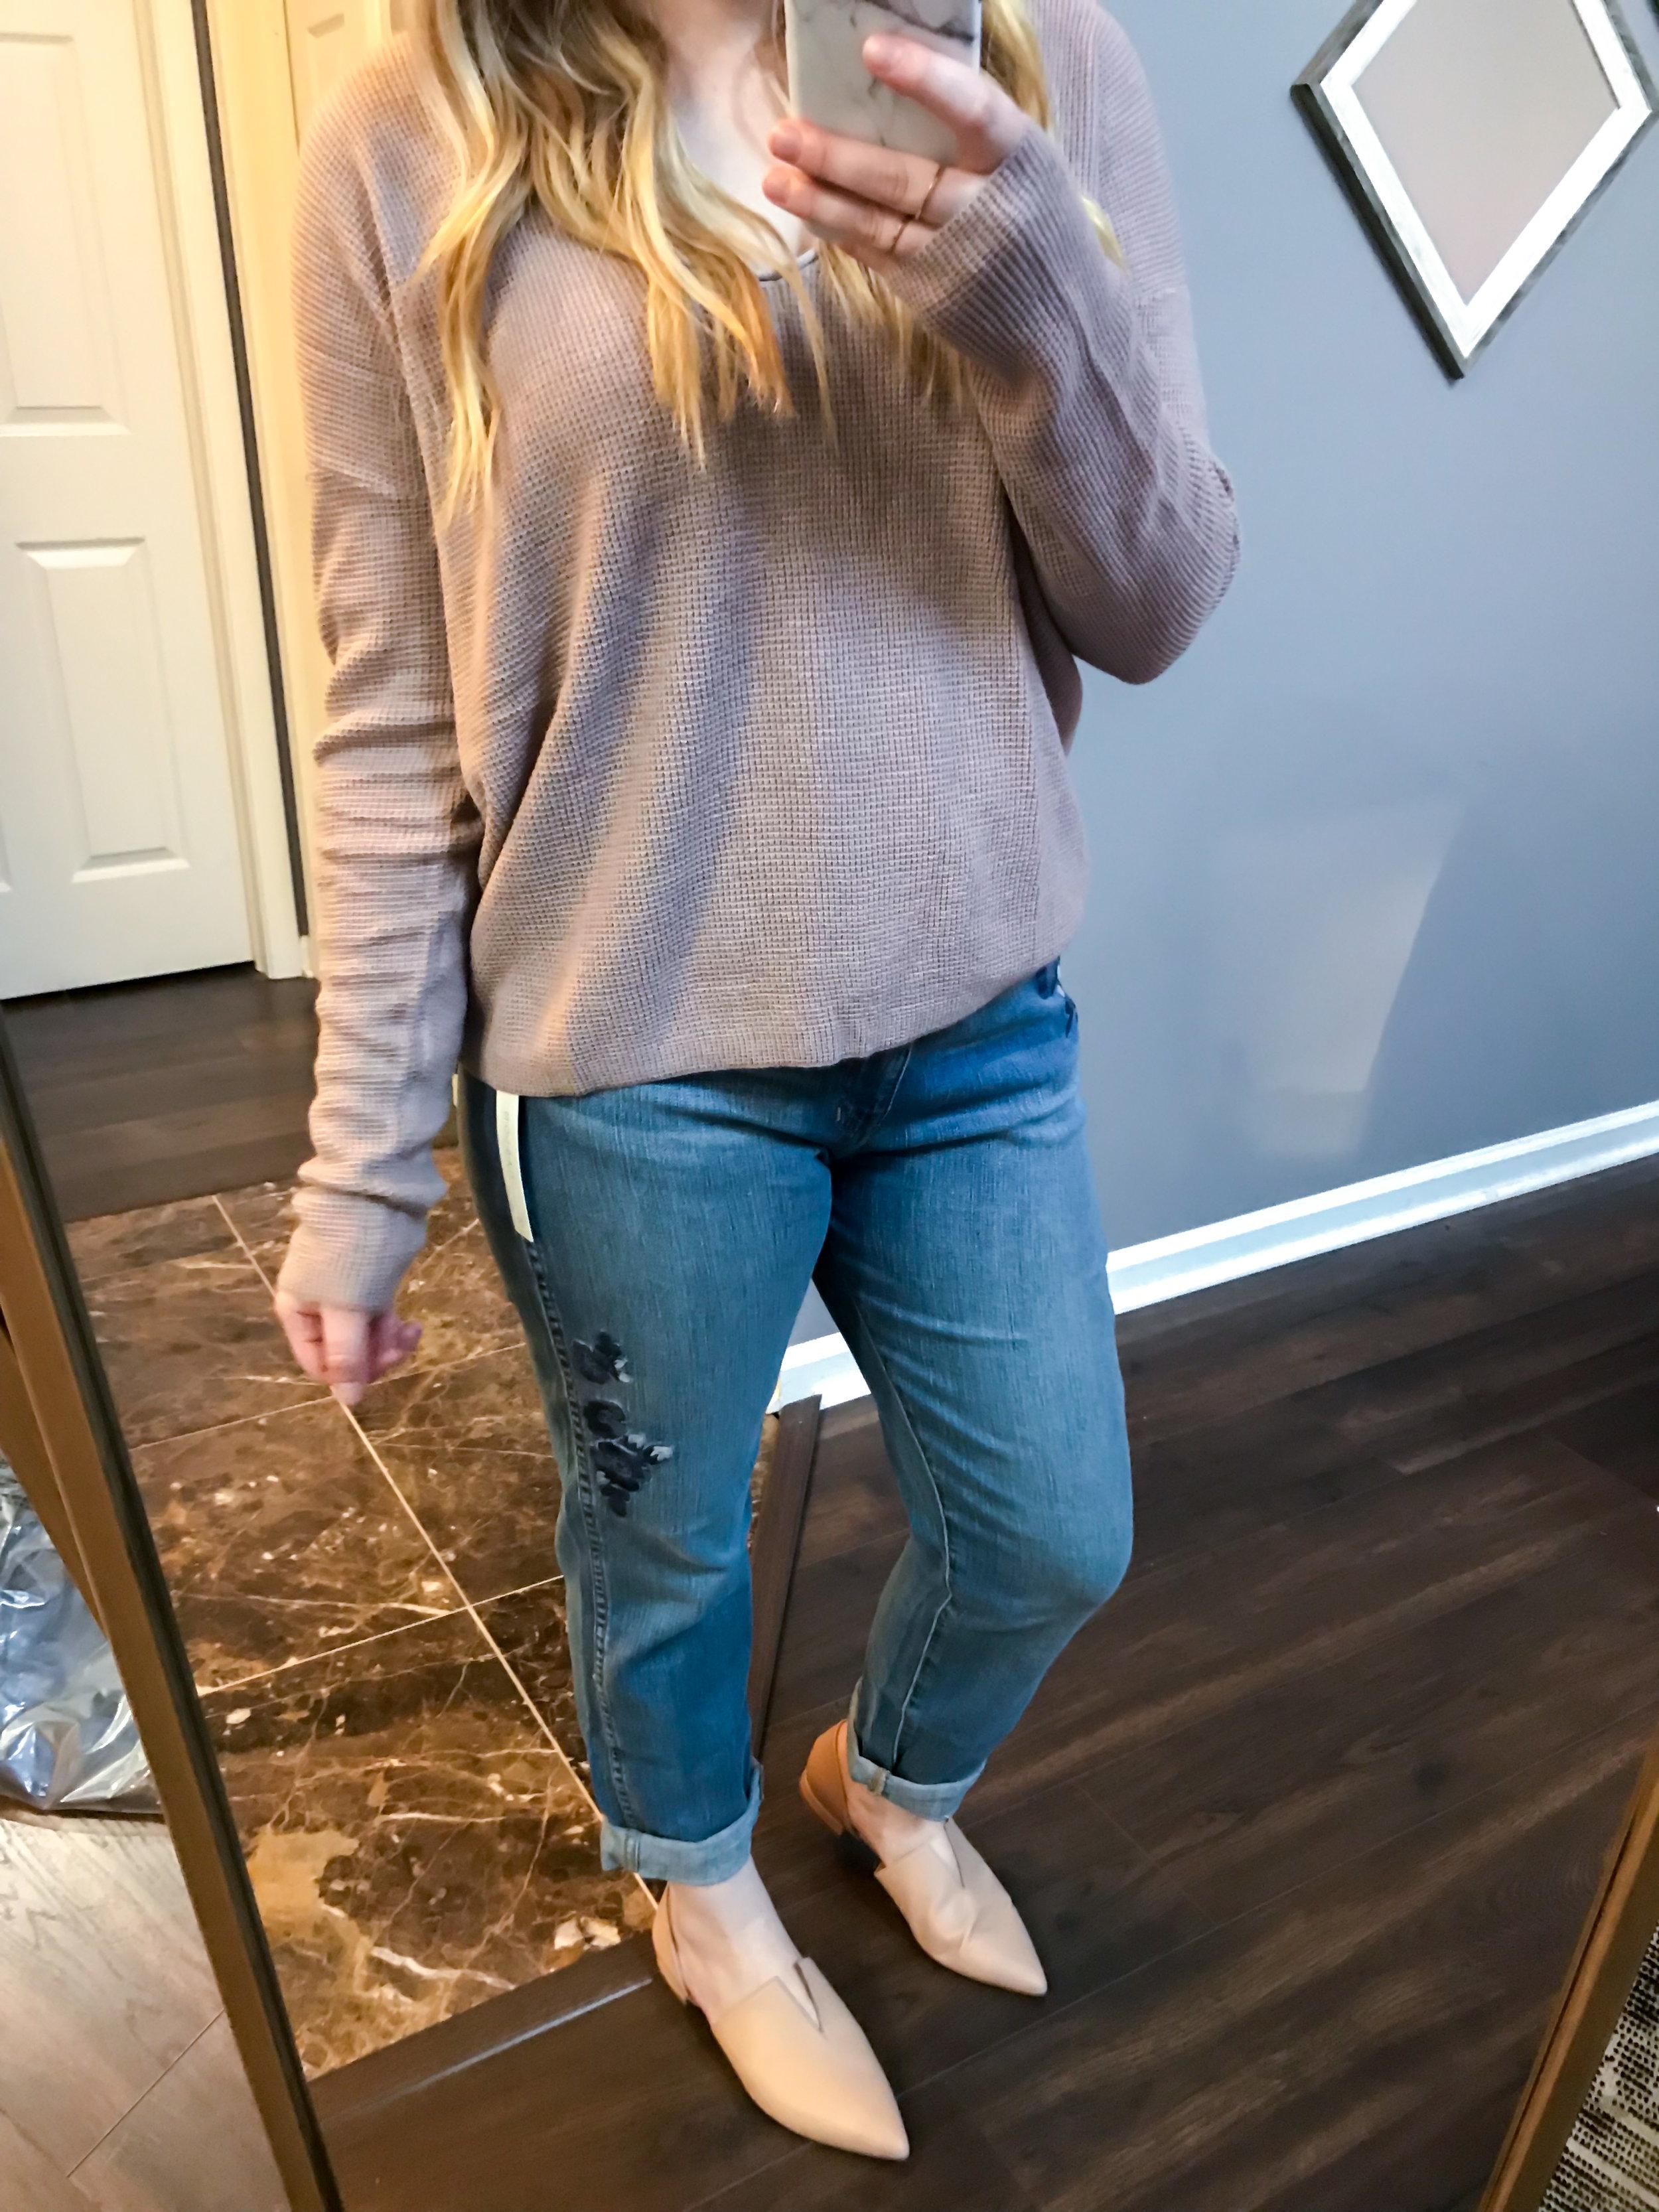 Maggie a la Mode Nordstrom Anniversary Sale 2018 BP. Textured Stitch V-Neck Pullover, Caslon Arden Embroidered Boyfriend Jeans, Vince Darlington Flats